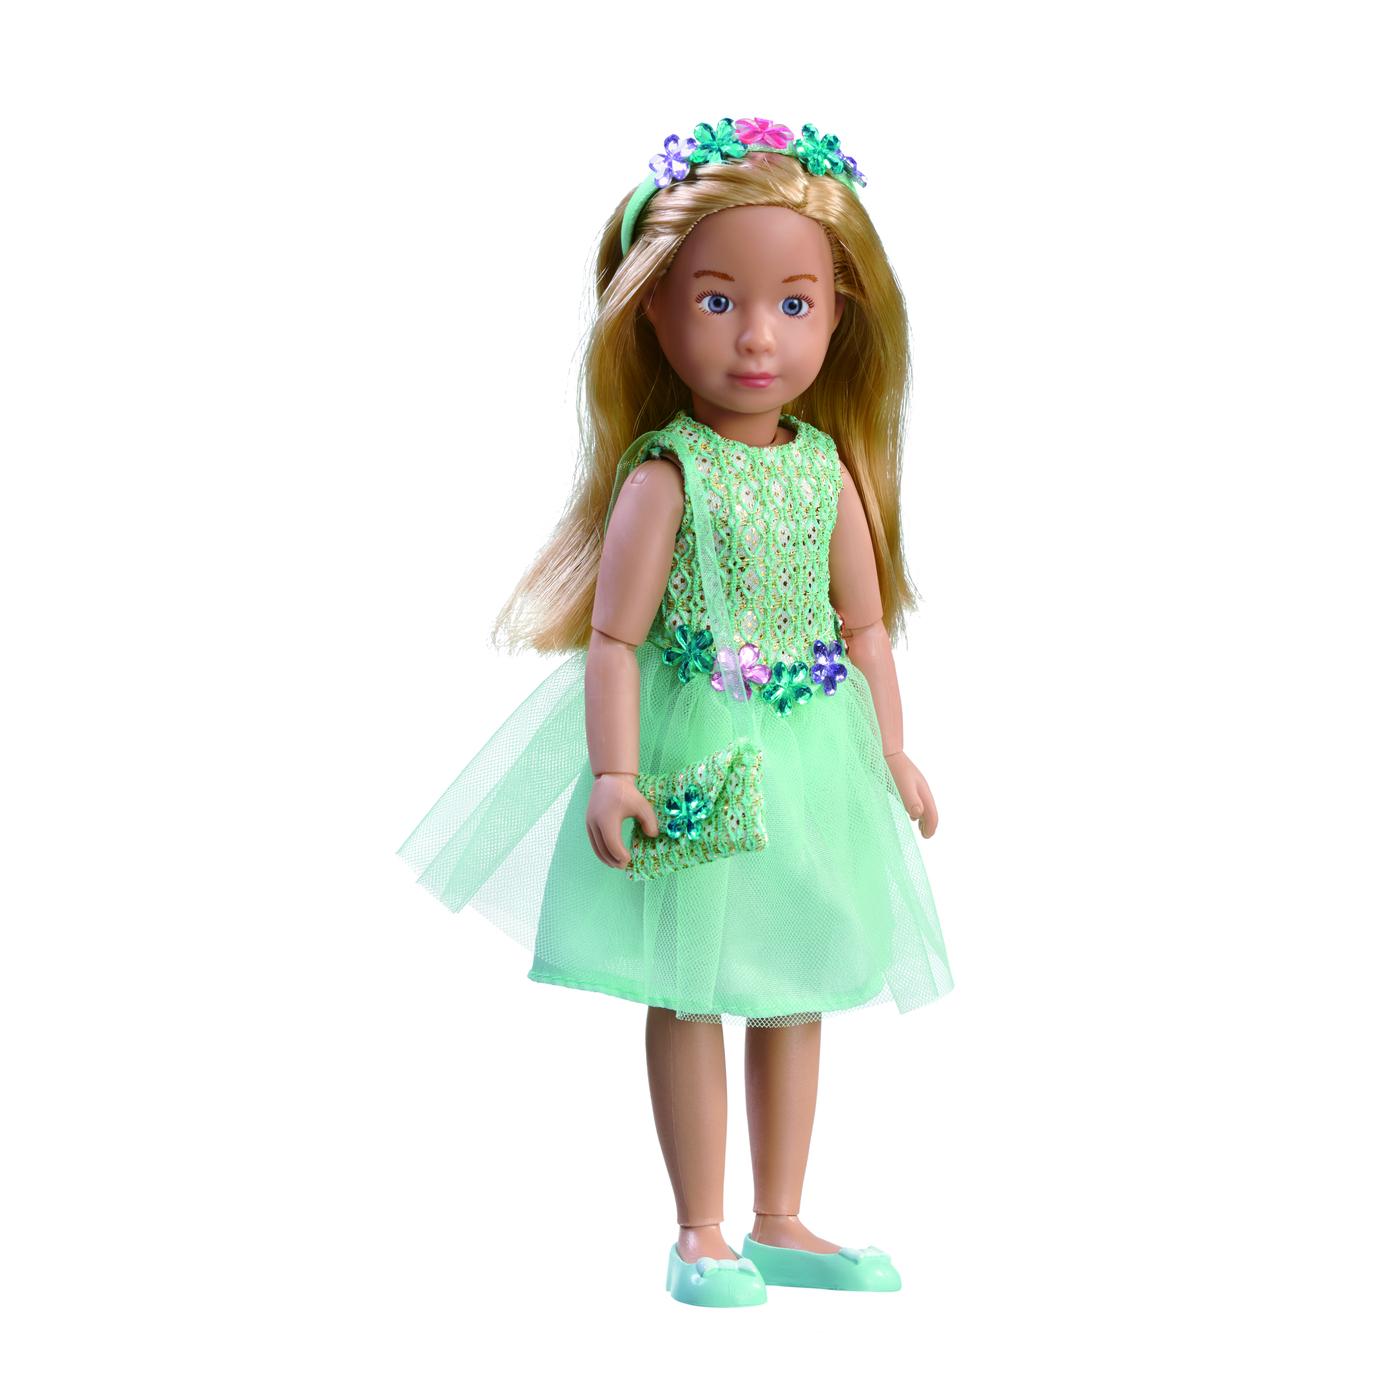 0126853 Кукла Вера Kruselings  нарядном платье для вечеринки